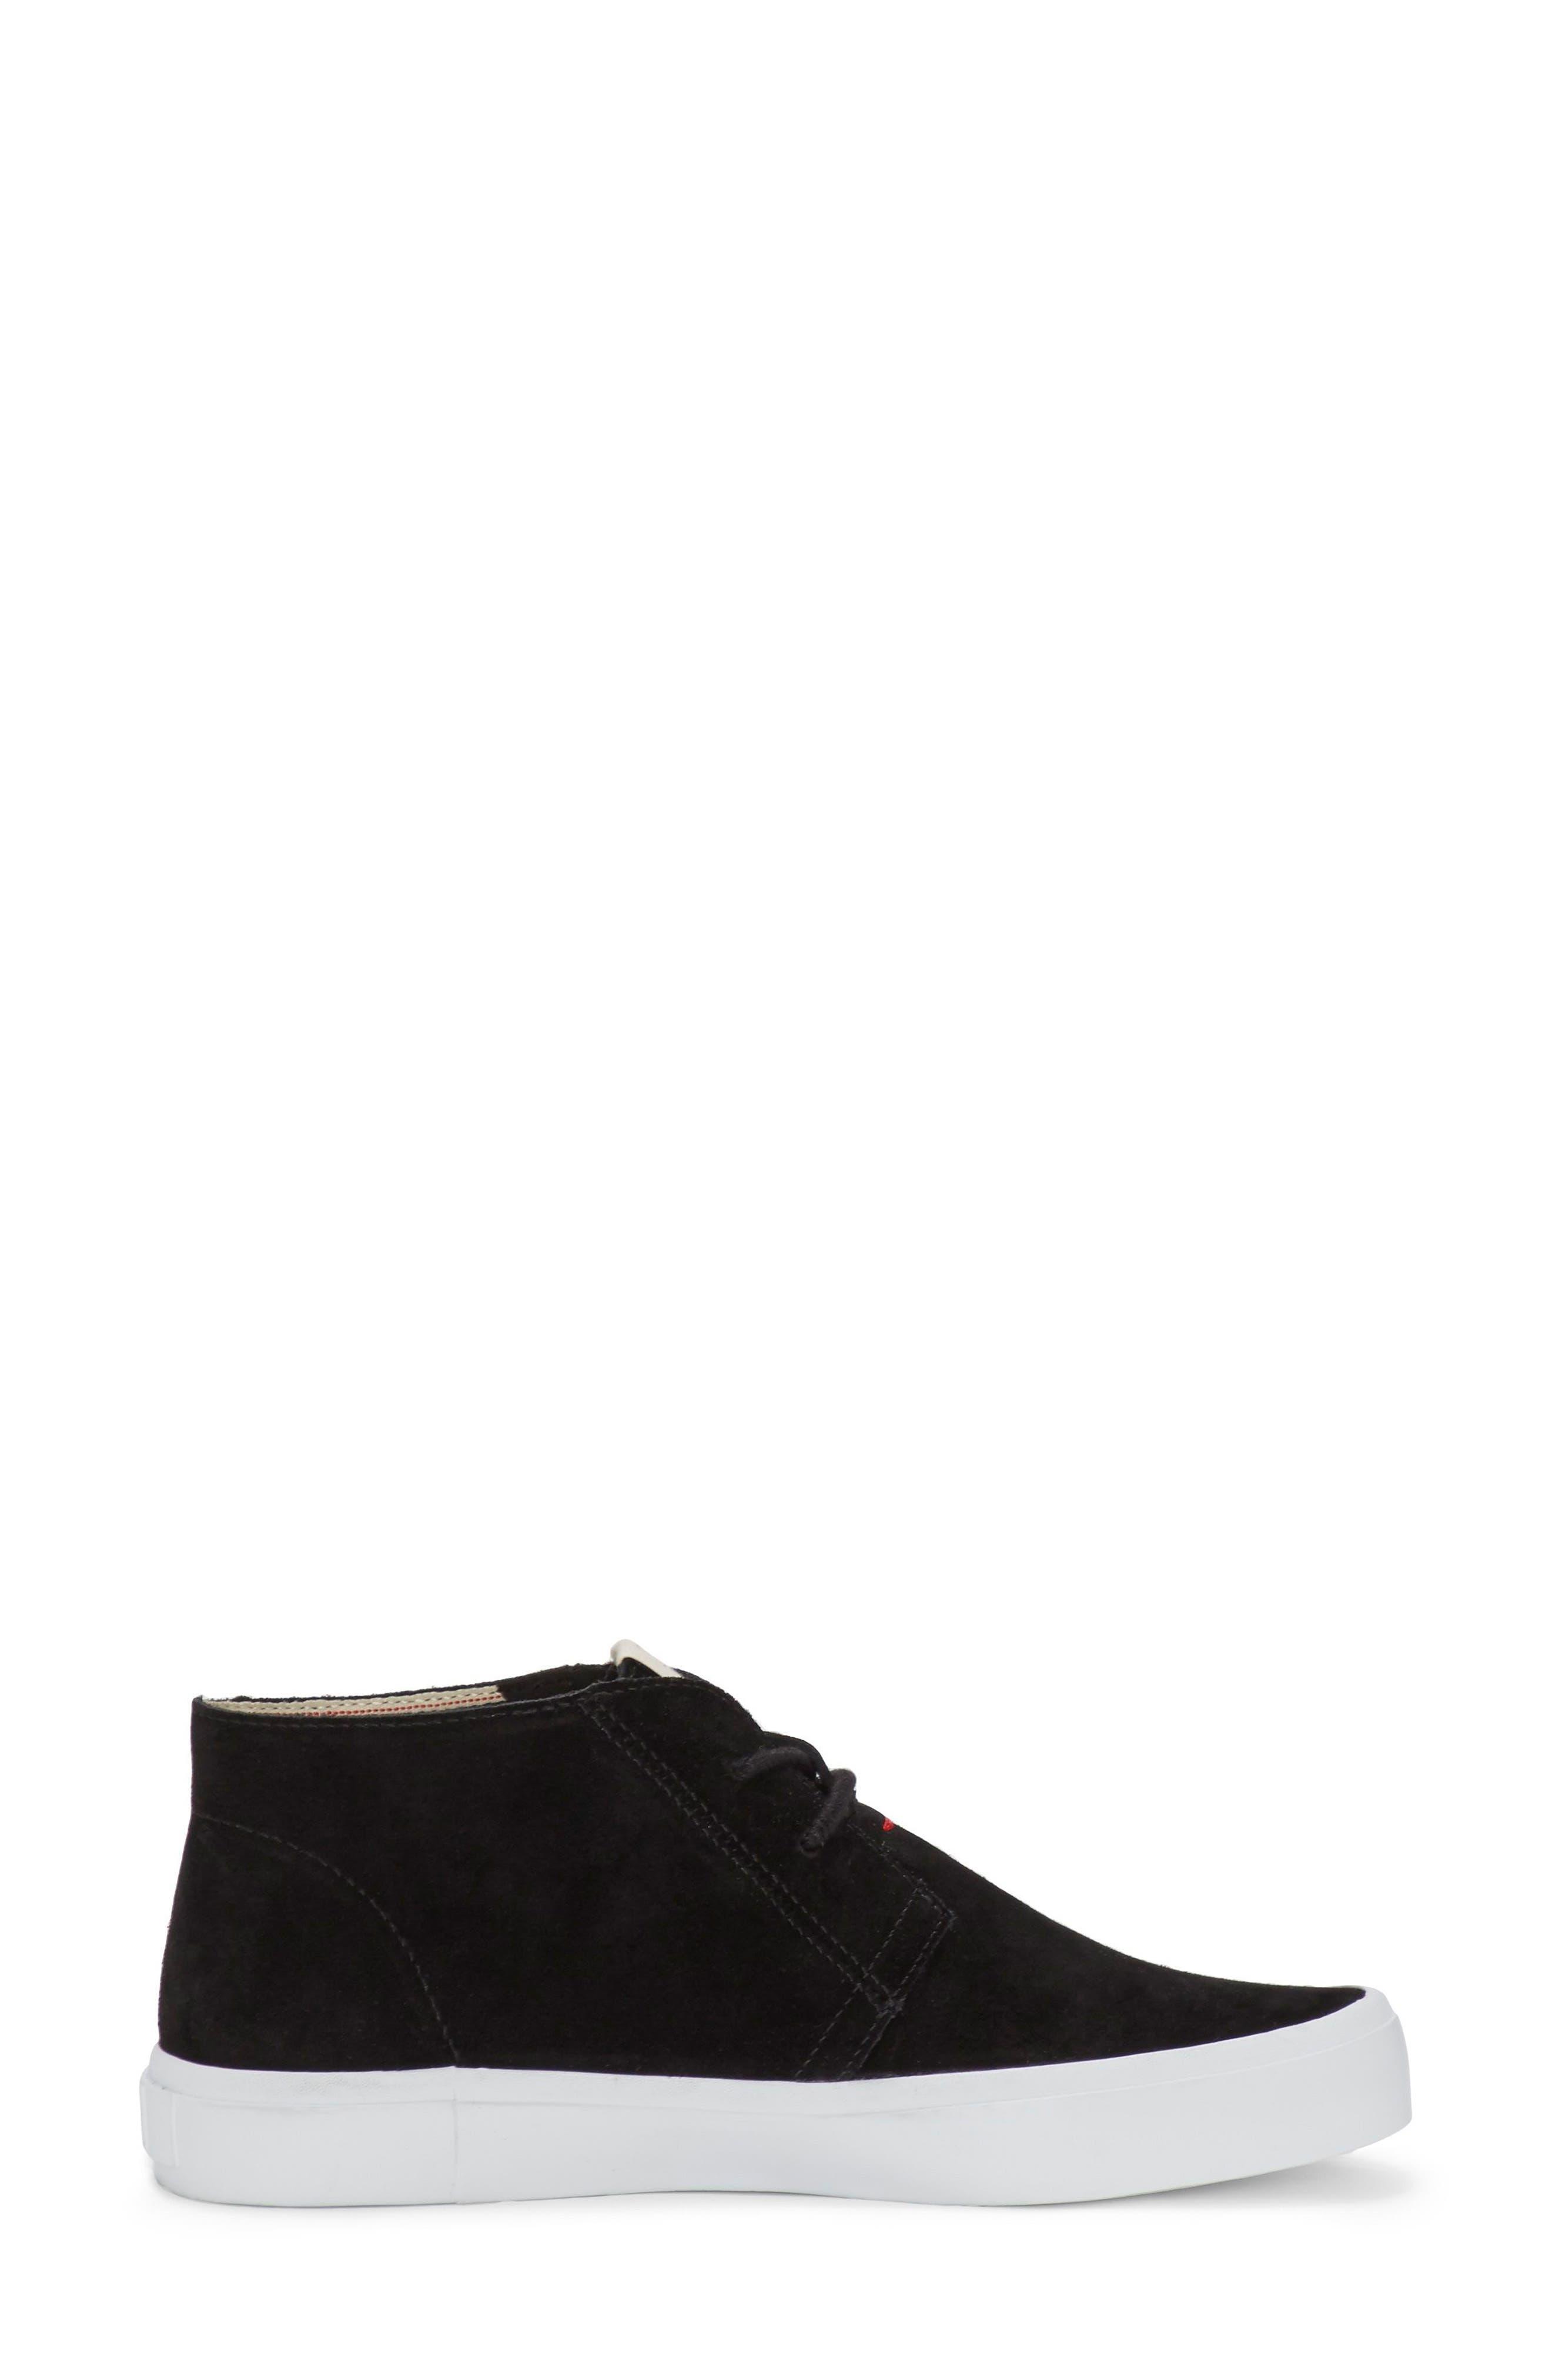 Dax Chukka Sneaker,                             Alternate thumbnail 3, color,                             002